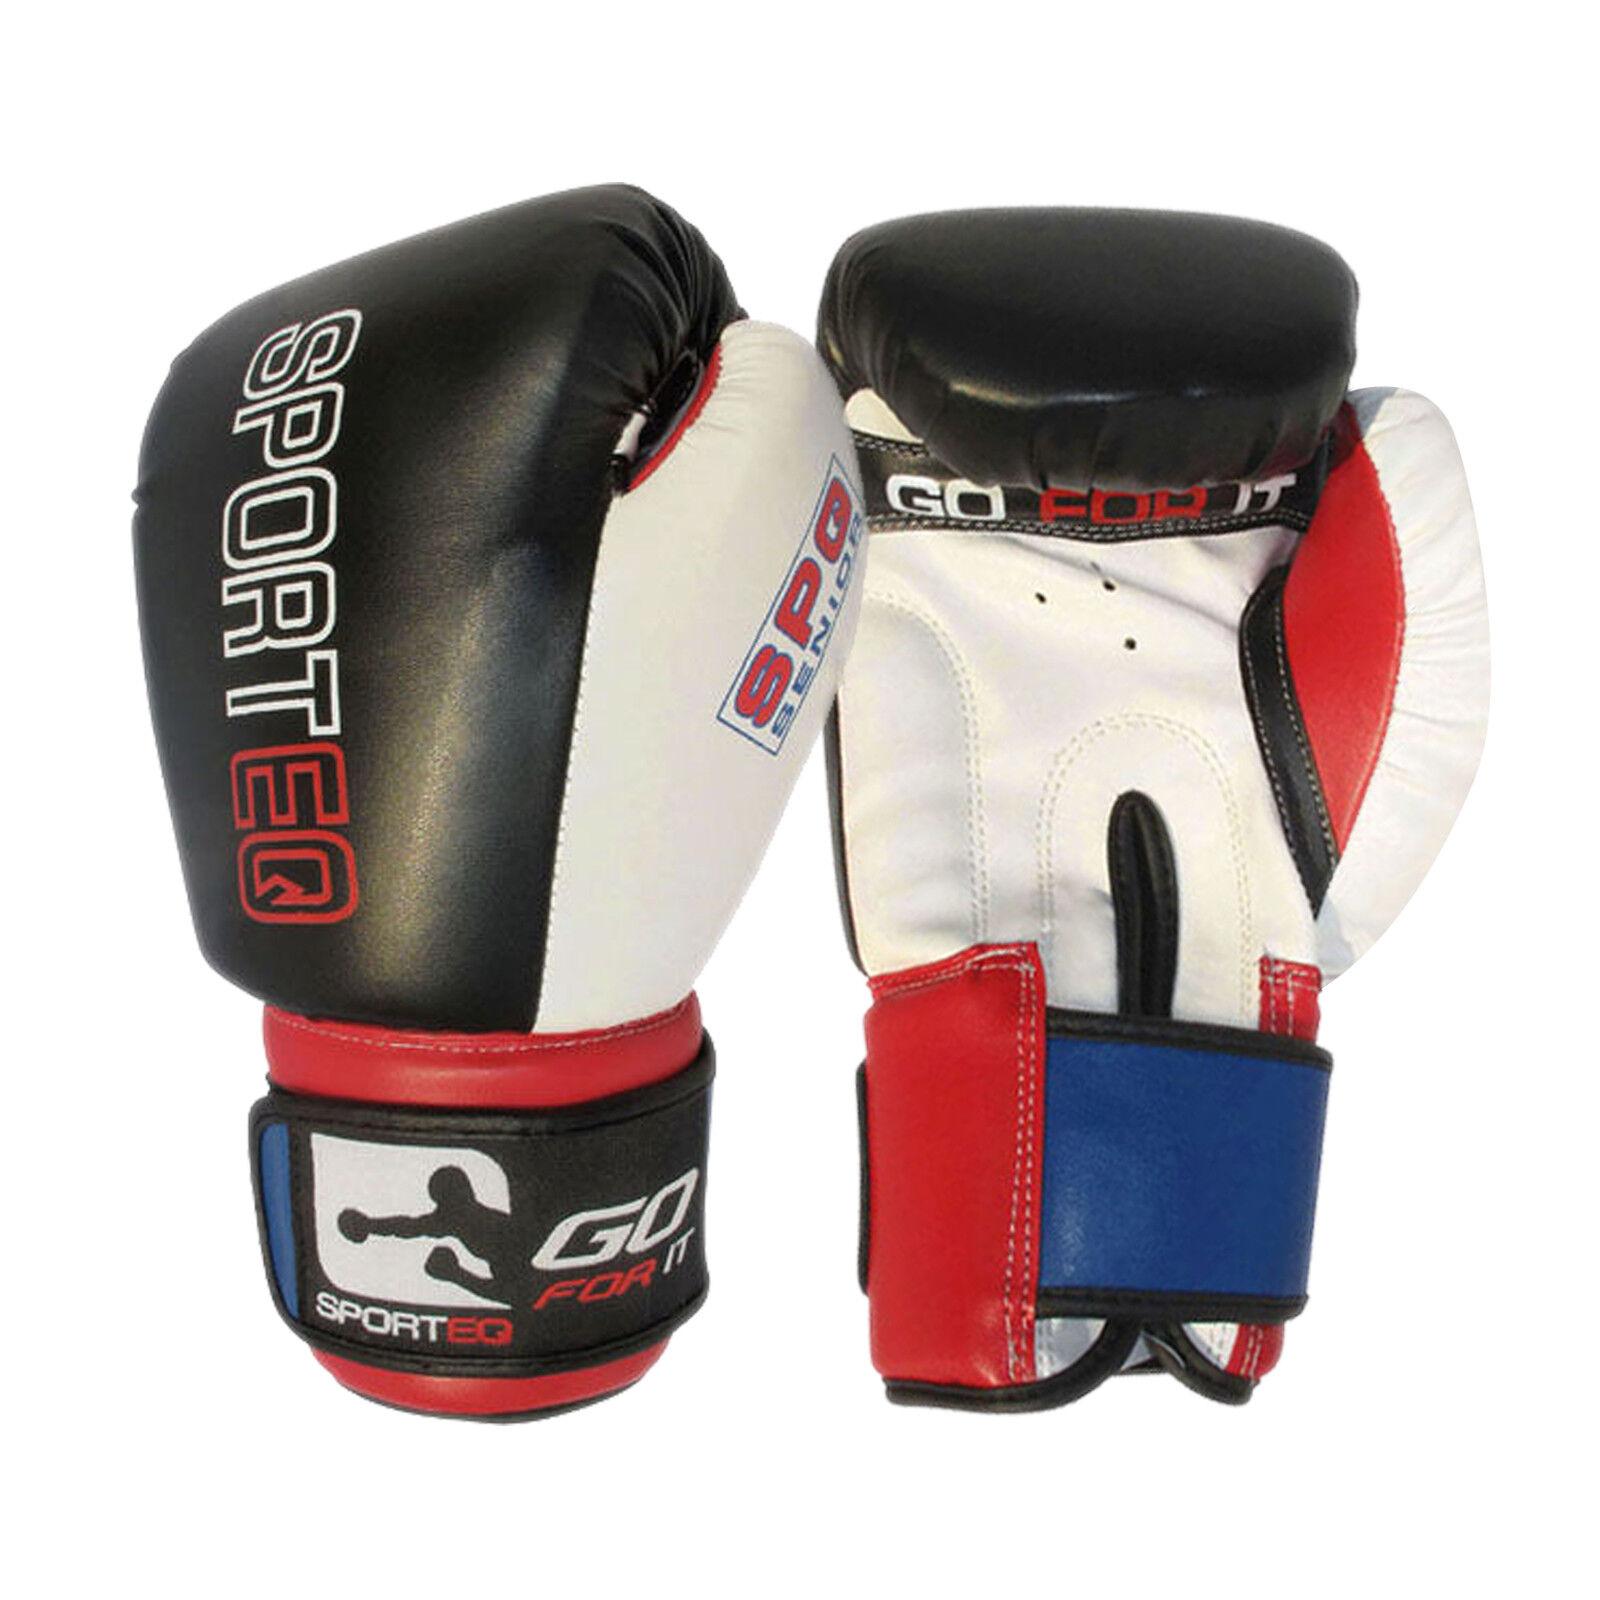 Sporteq Kinder PRO Boxen Sparringshandschuhe, PREMIUM MMA Training 4oz - 16oz